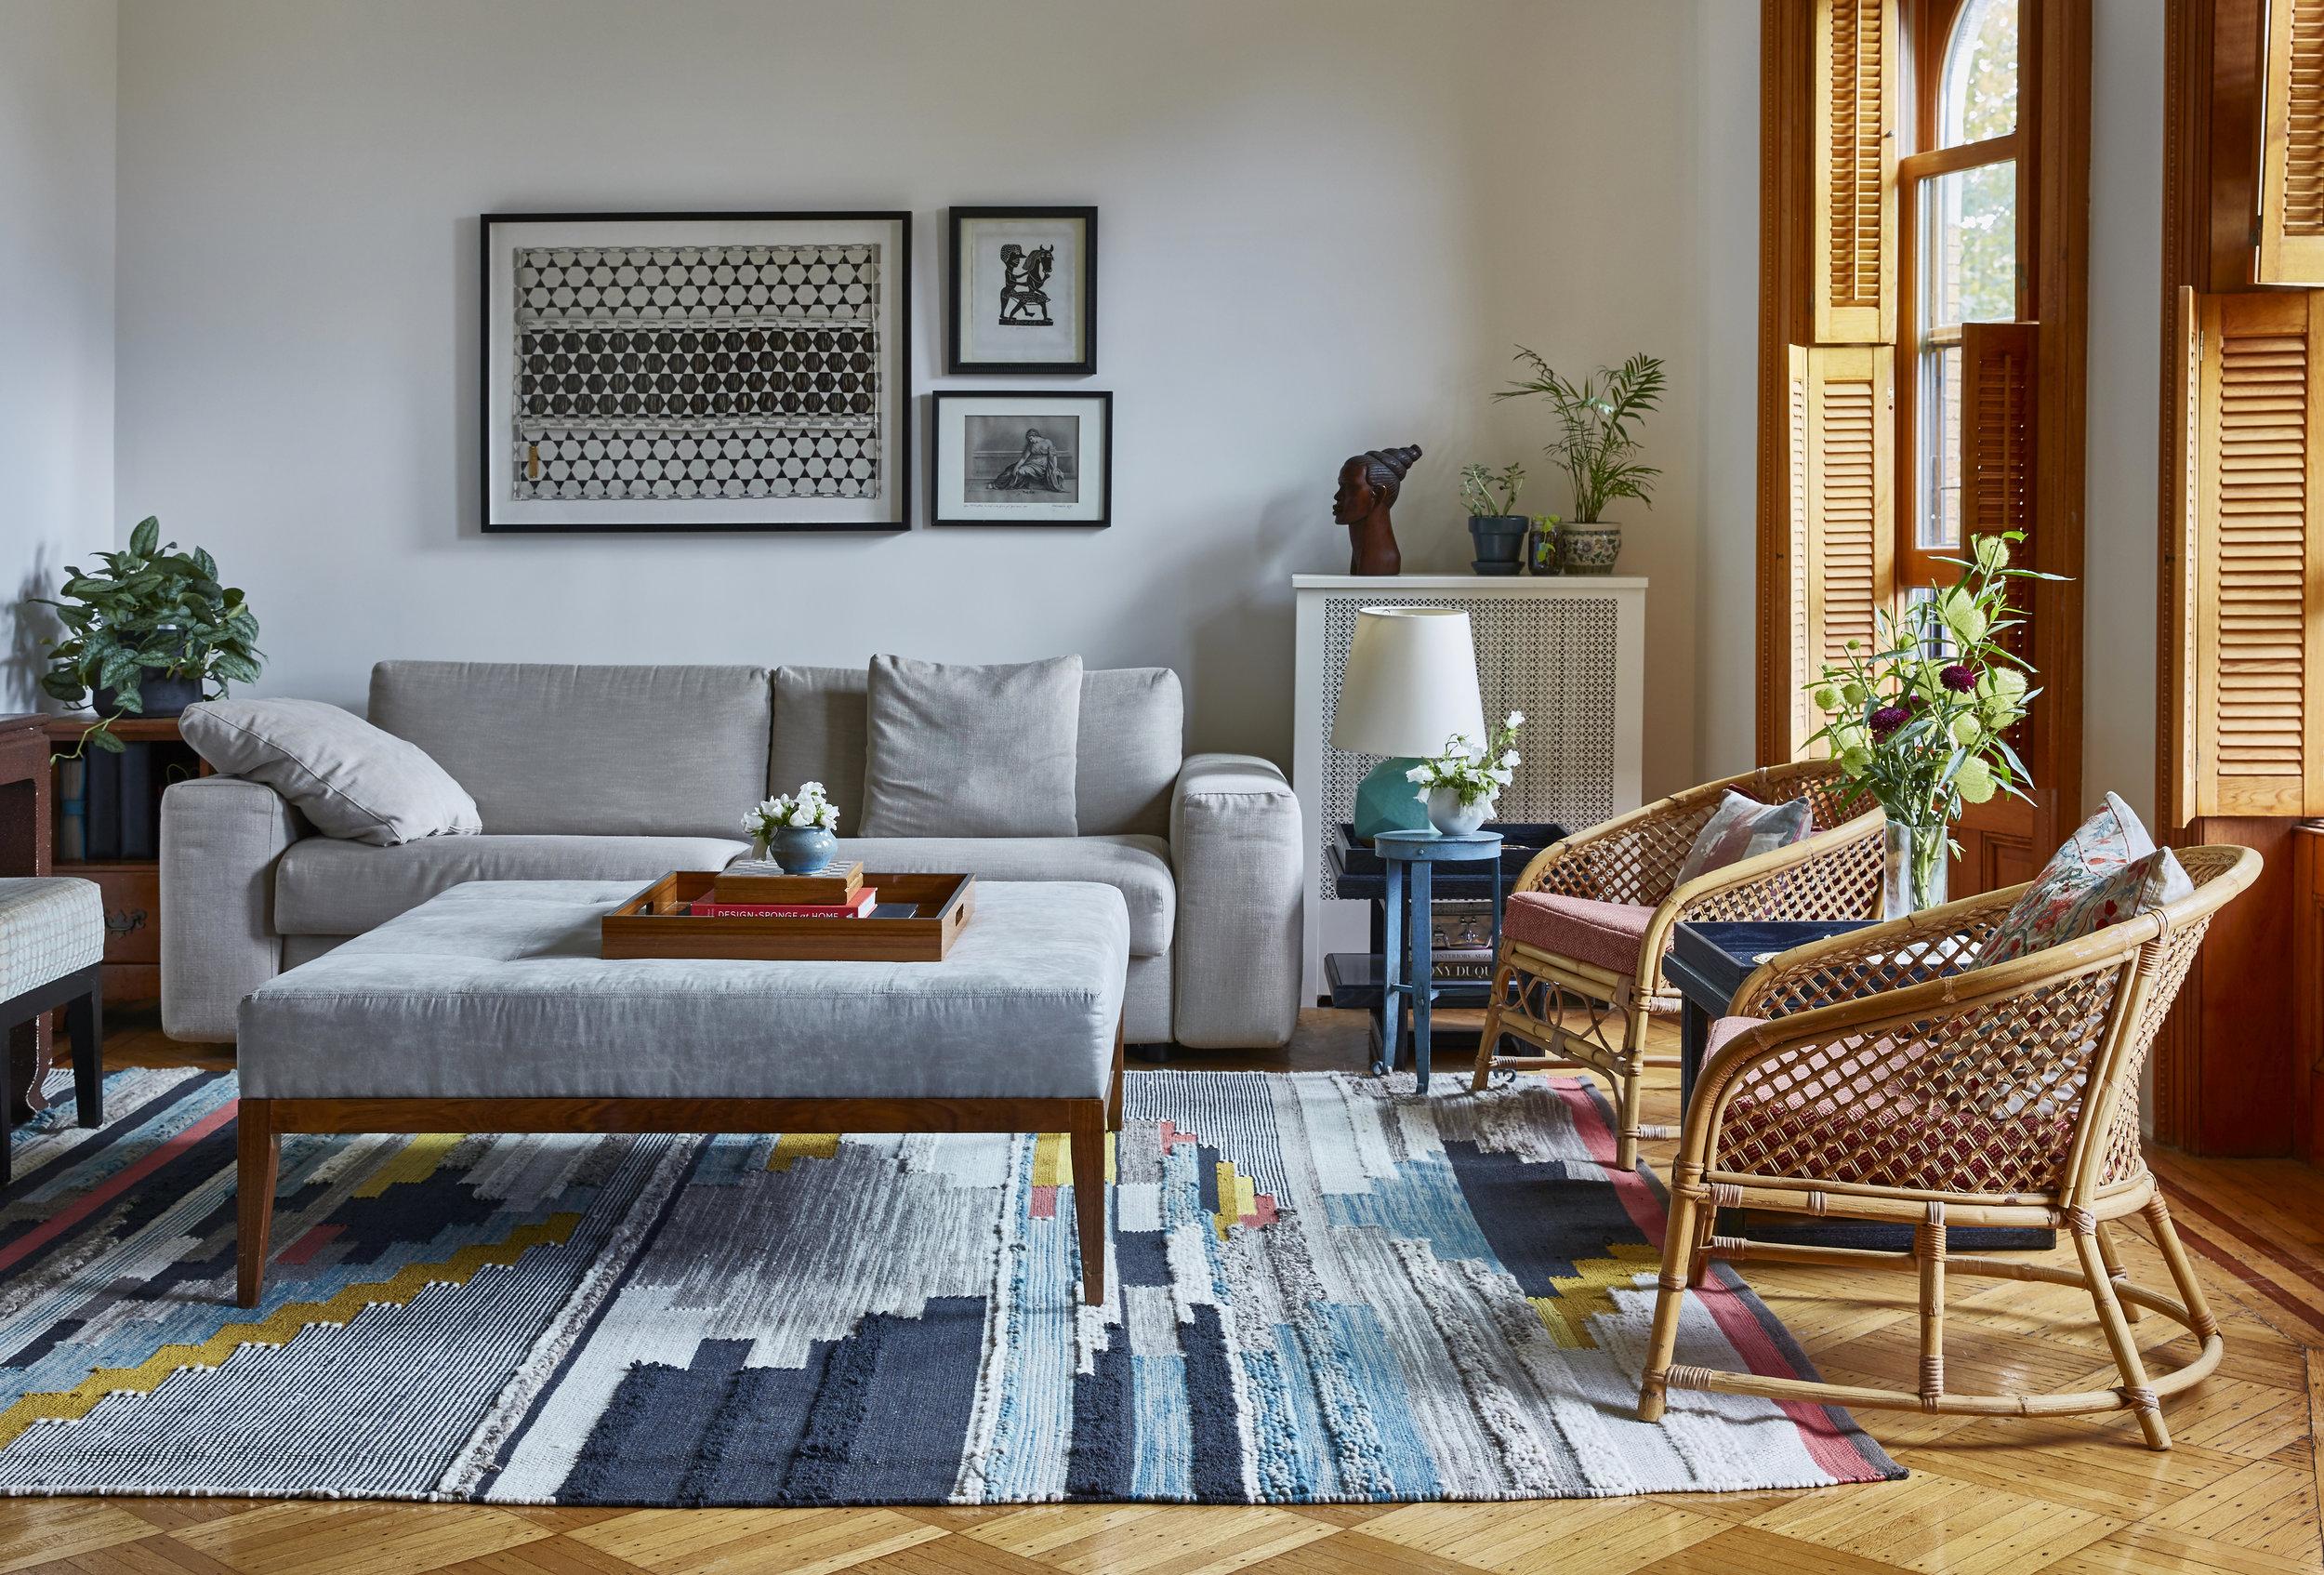 Midcentury Modern Colorful Living Room Park Slope Brooklyn JMorris Design Interior Designer Online